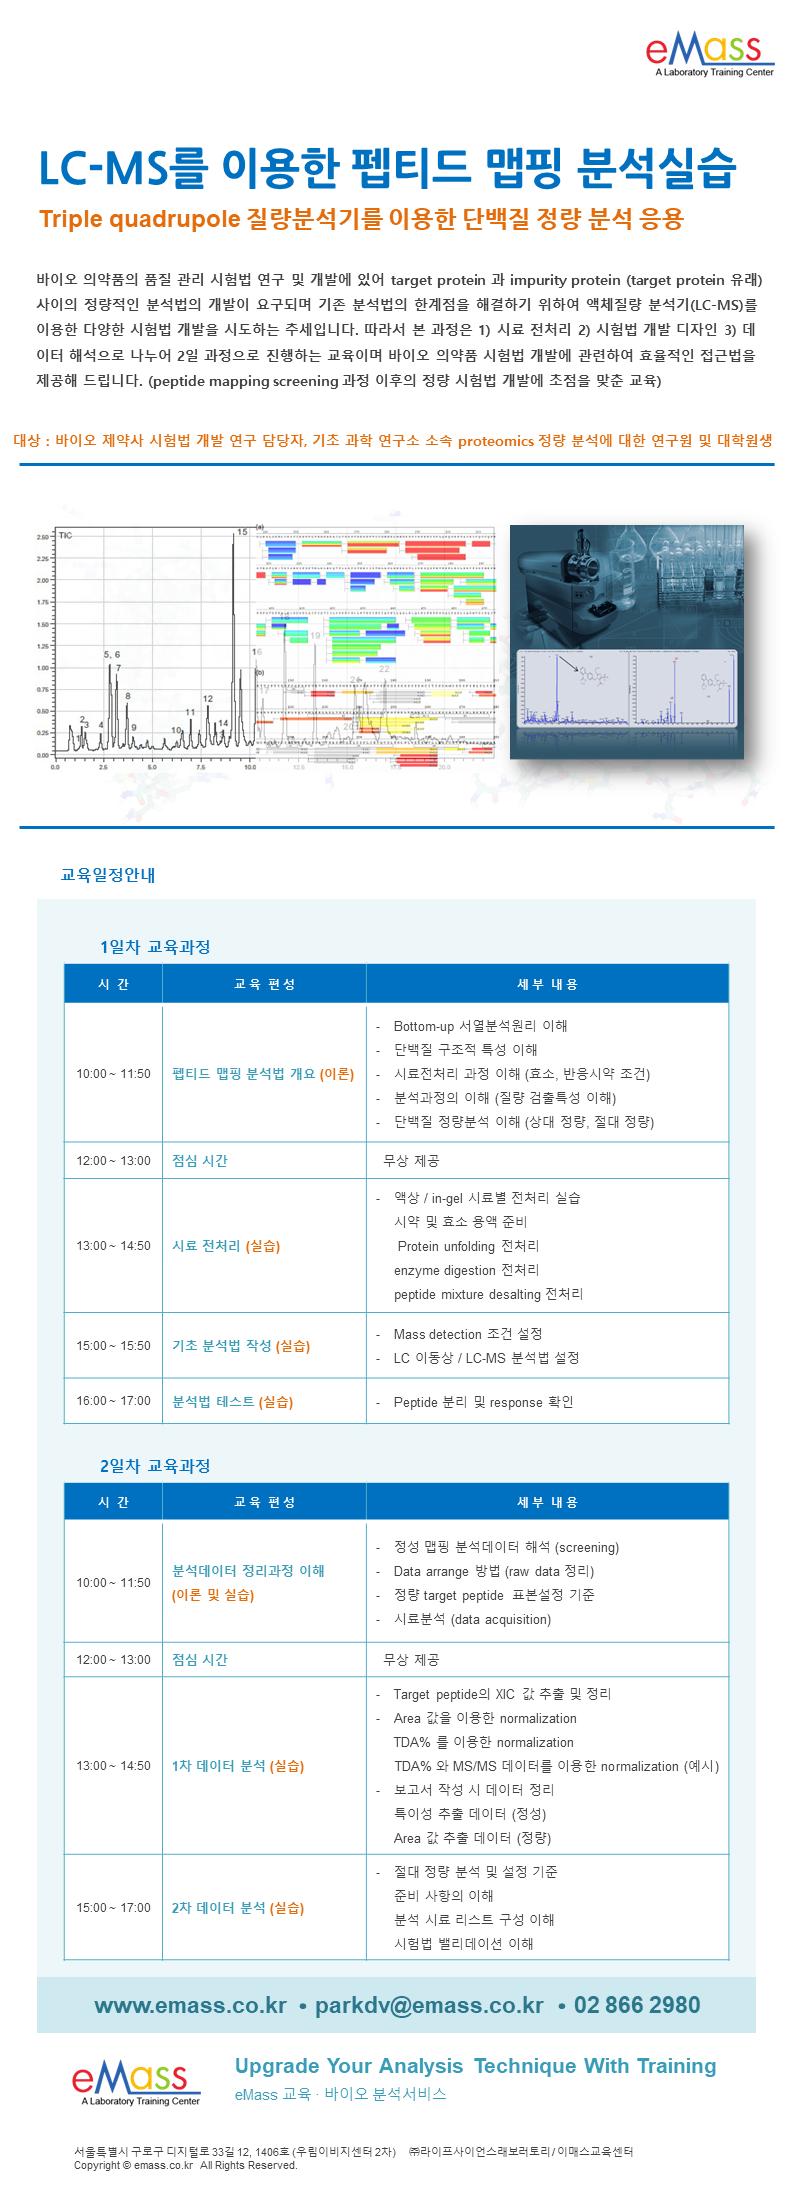 LCMS를 이용한 펩티드맵핑 분석실습_2일 과정.png